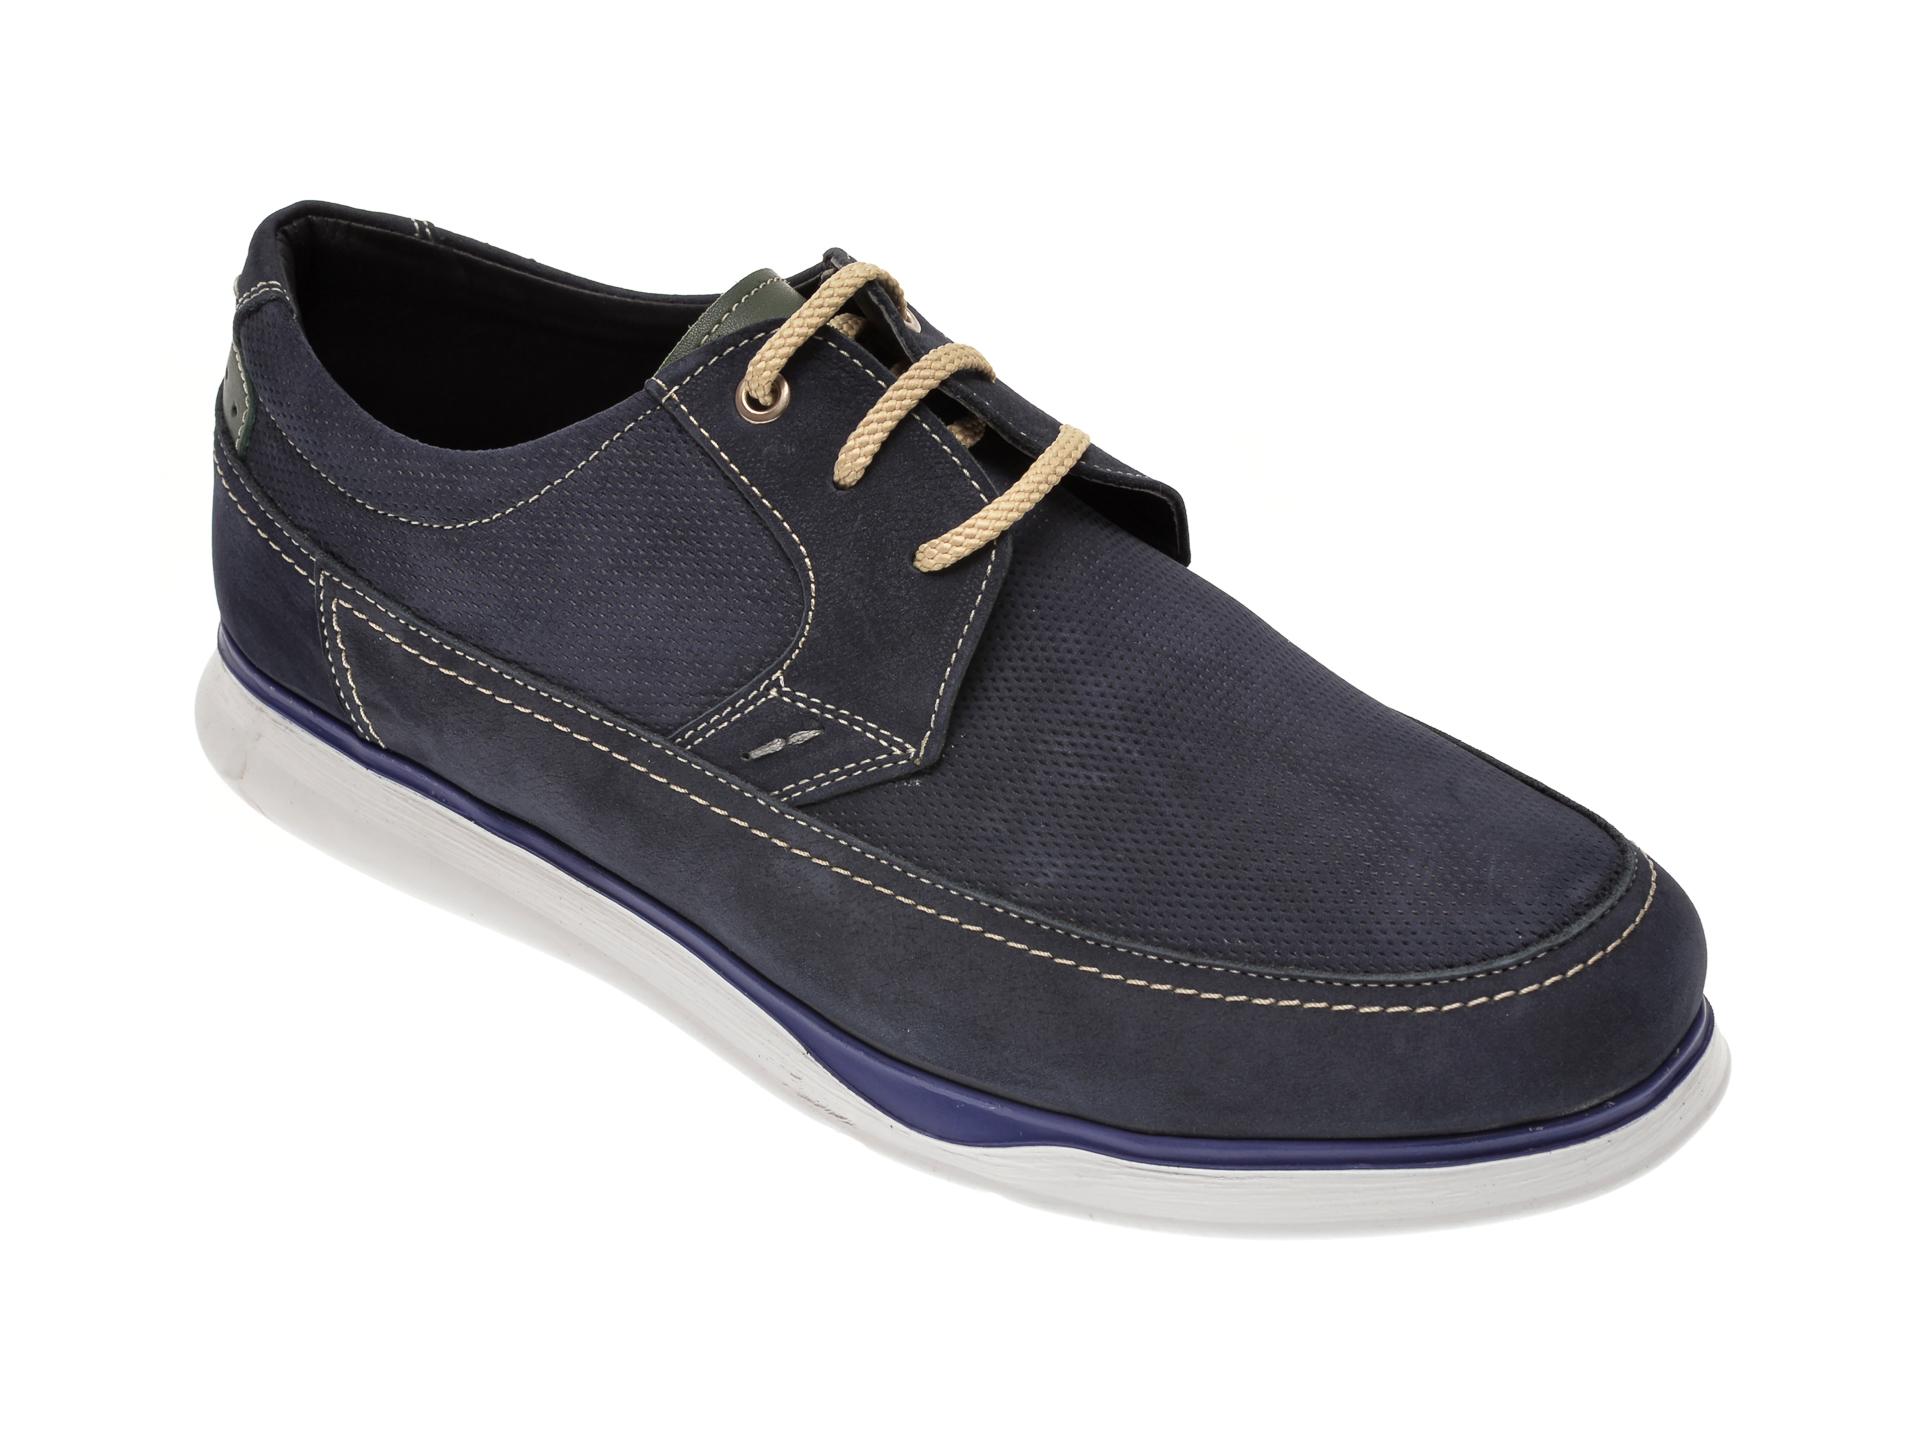 Pantofi OTTER bleumarin, 19332, din piele intoarsa imagine